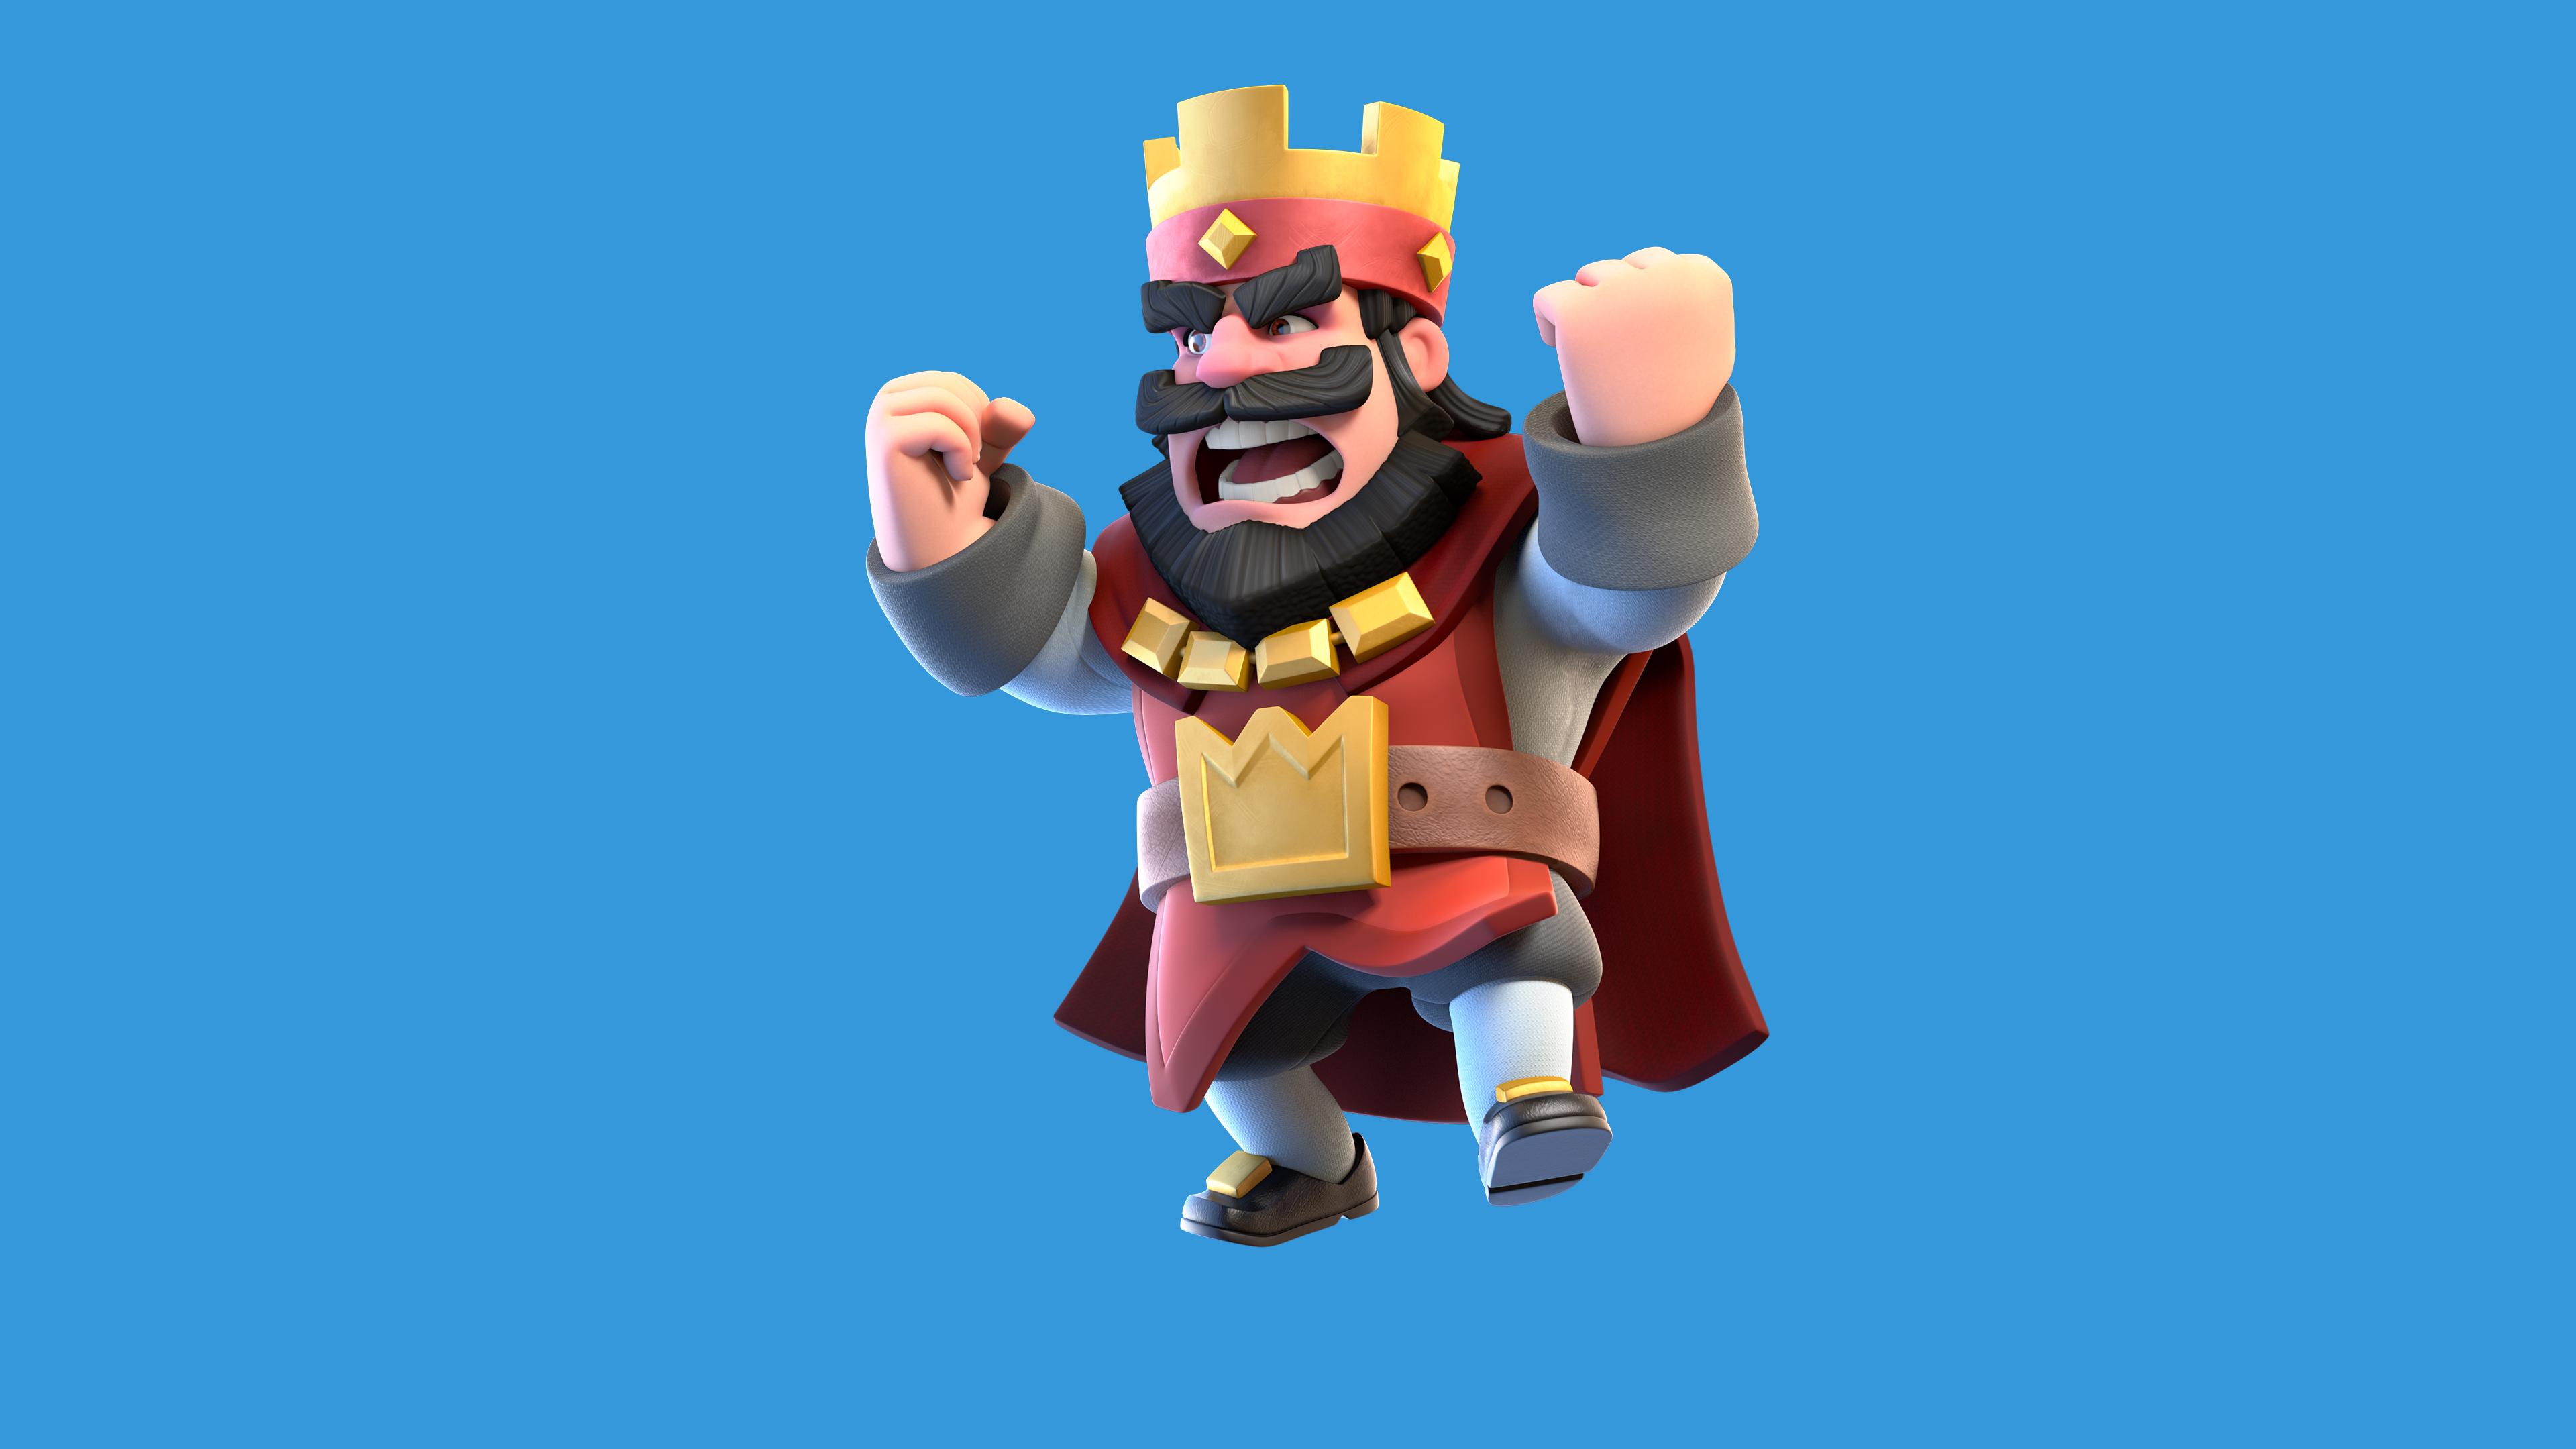 clash royale red king 1536009006 - Clash Royale Red King - supercell wallpapers, games wallpapers, clash royale wallpapers, 2016 games wallpapers